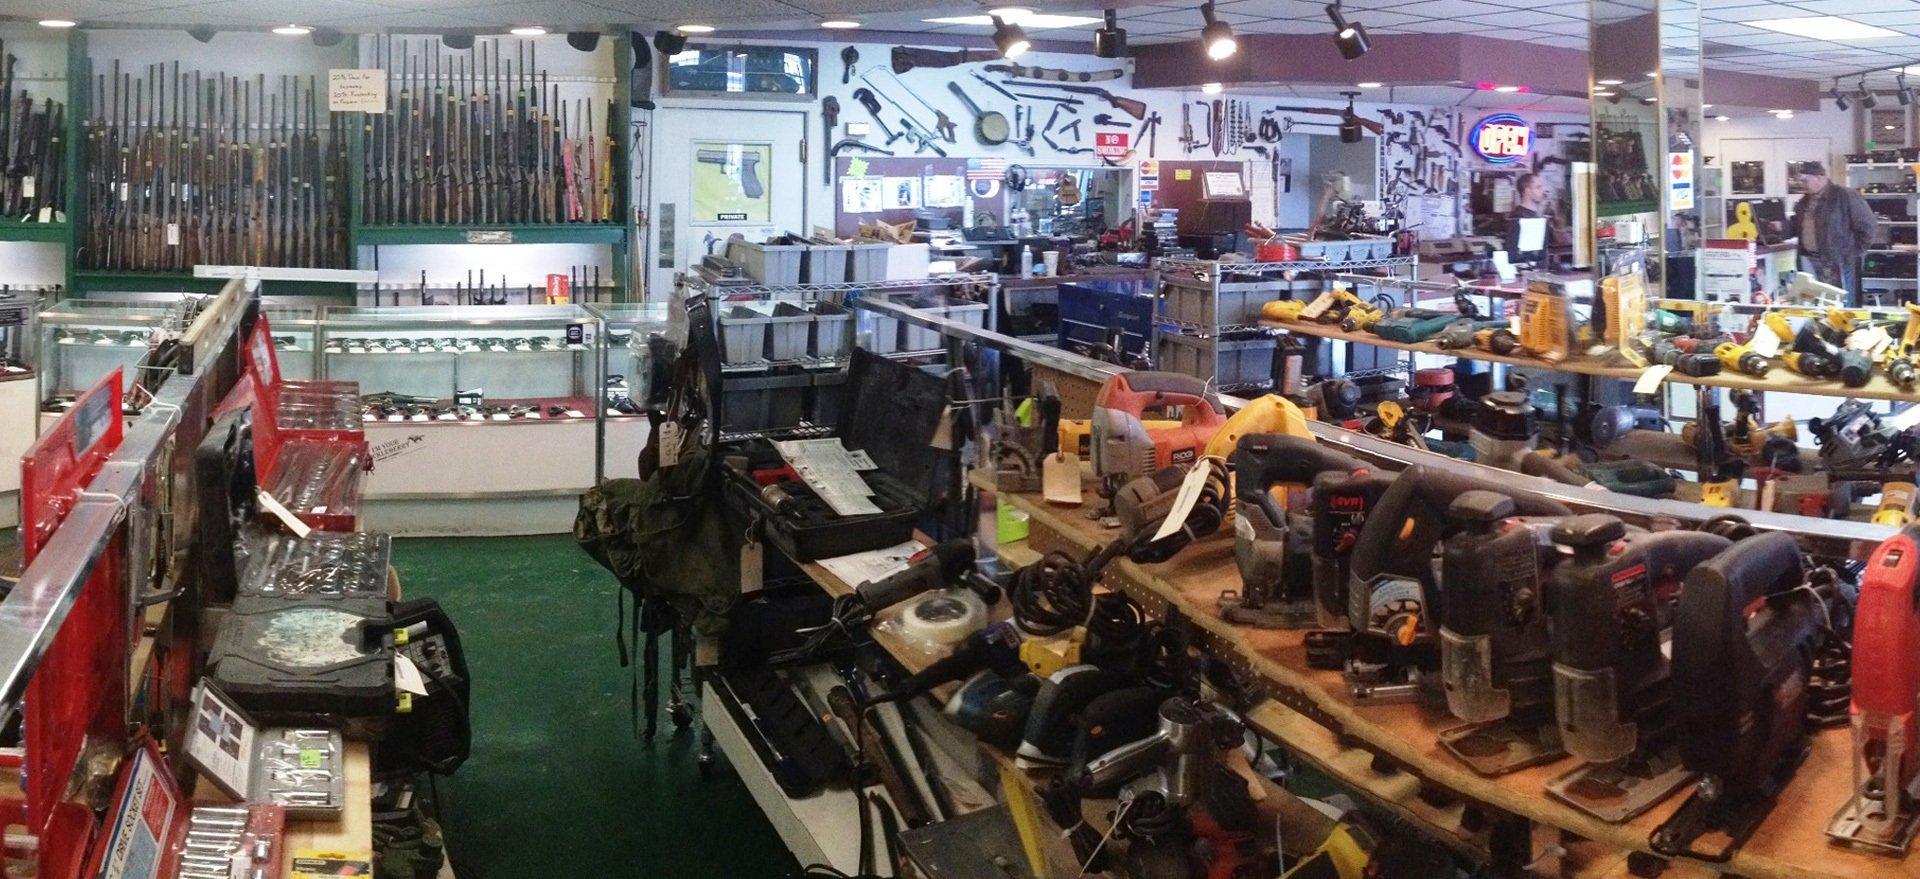 Pawn Store Guns Odessa, TX